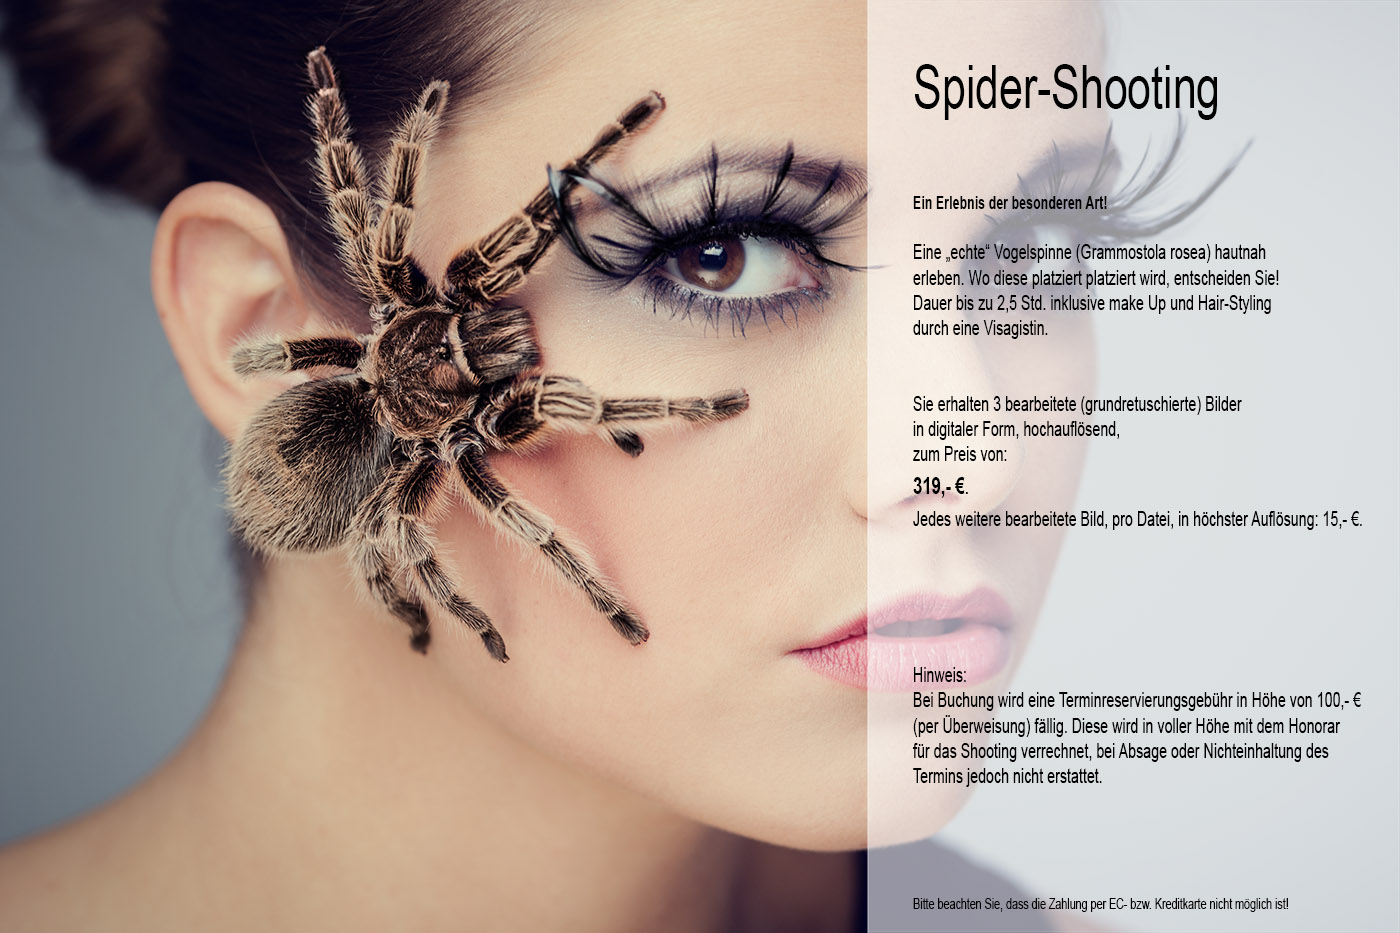 vogelspinnen-shooting-angebot